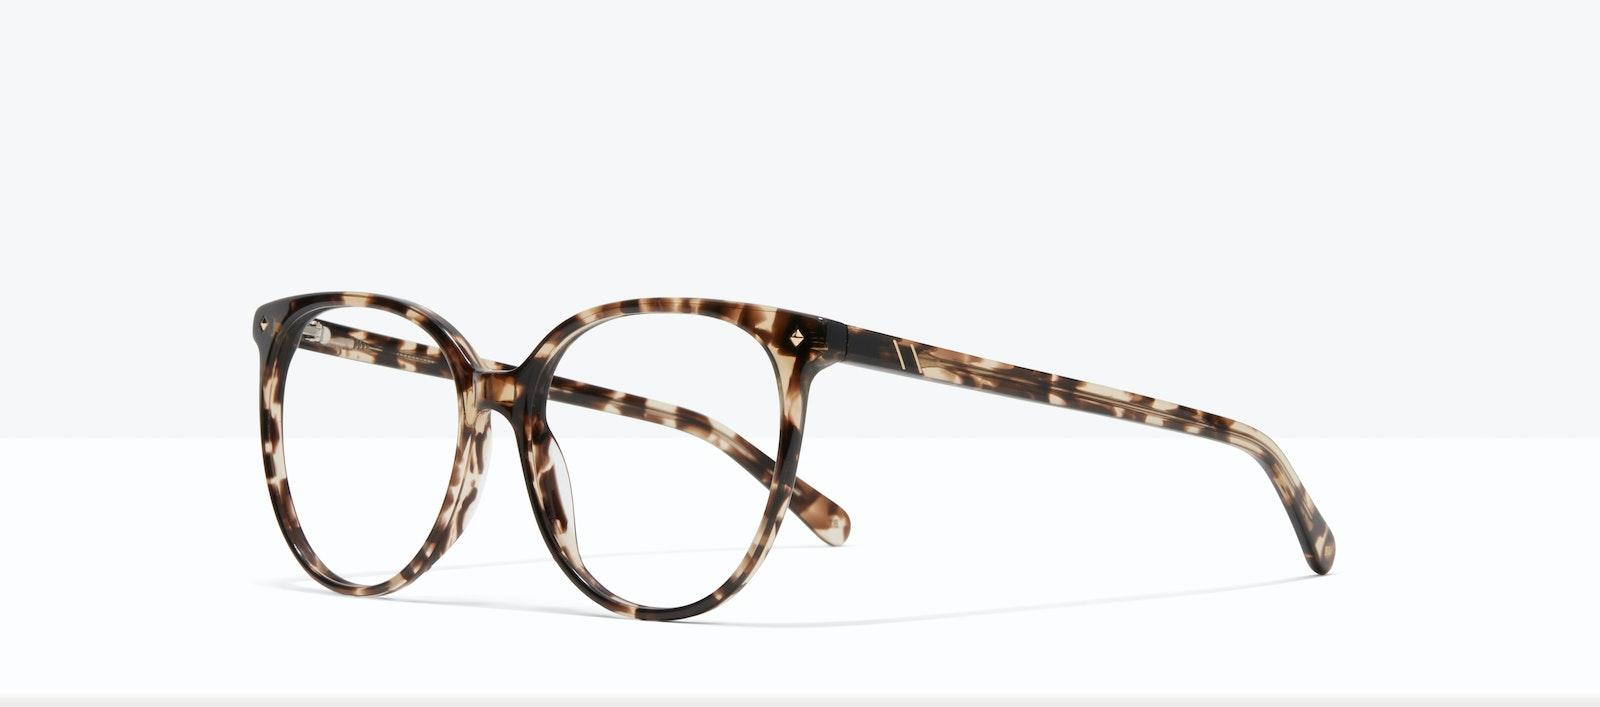 Affordable Fashion Glasses Round Eyeglasses Women Area L Leopard Tilt